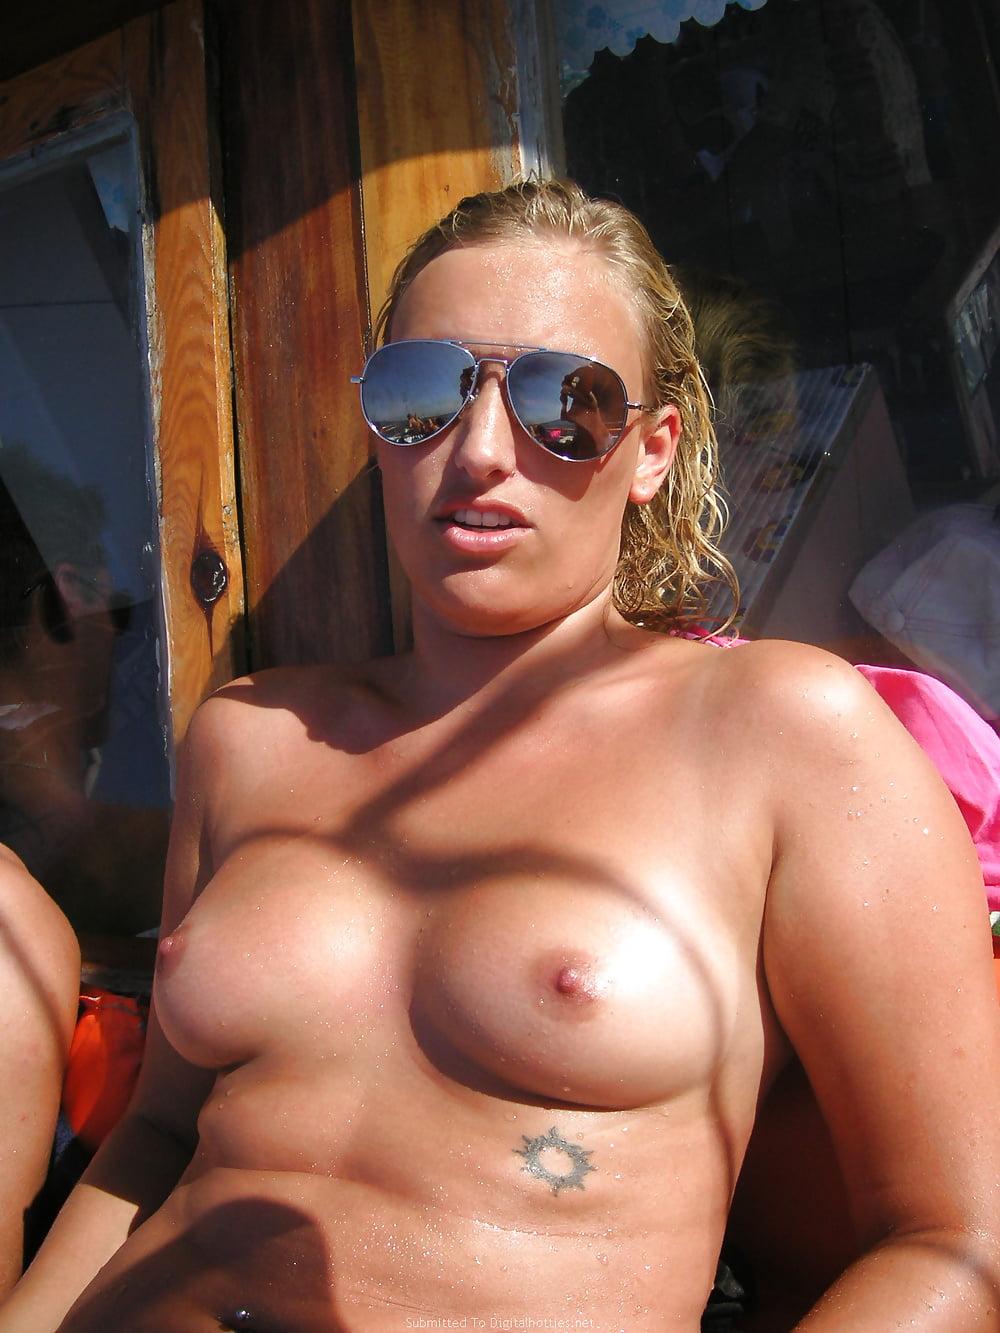 Toplles porn dowoad gratis — img 11